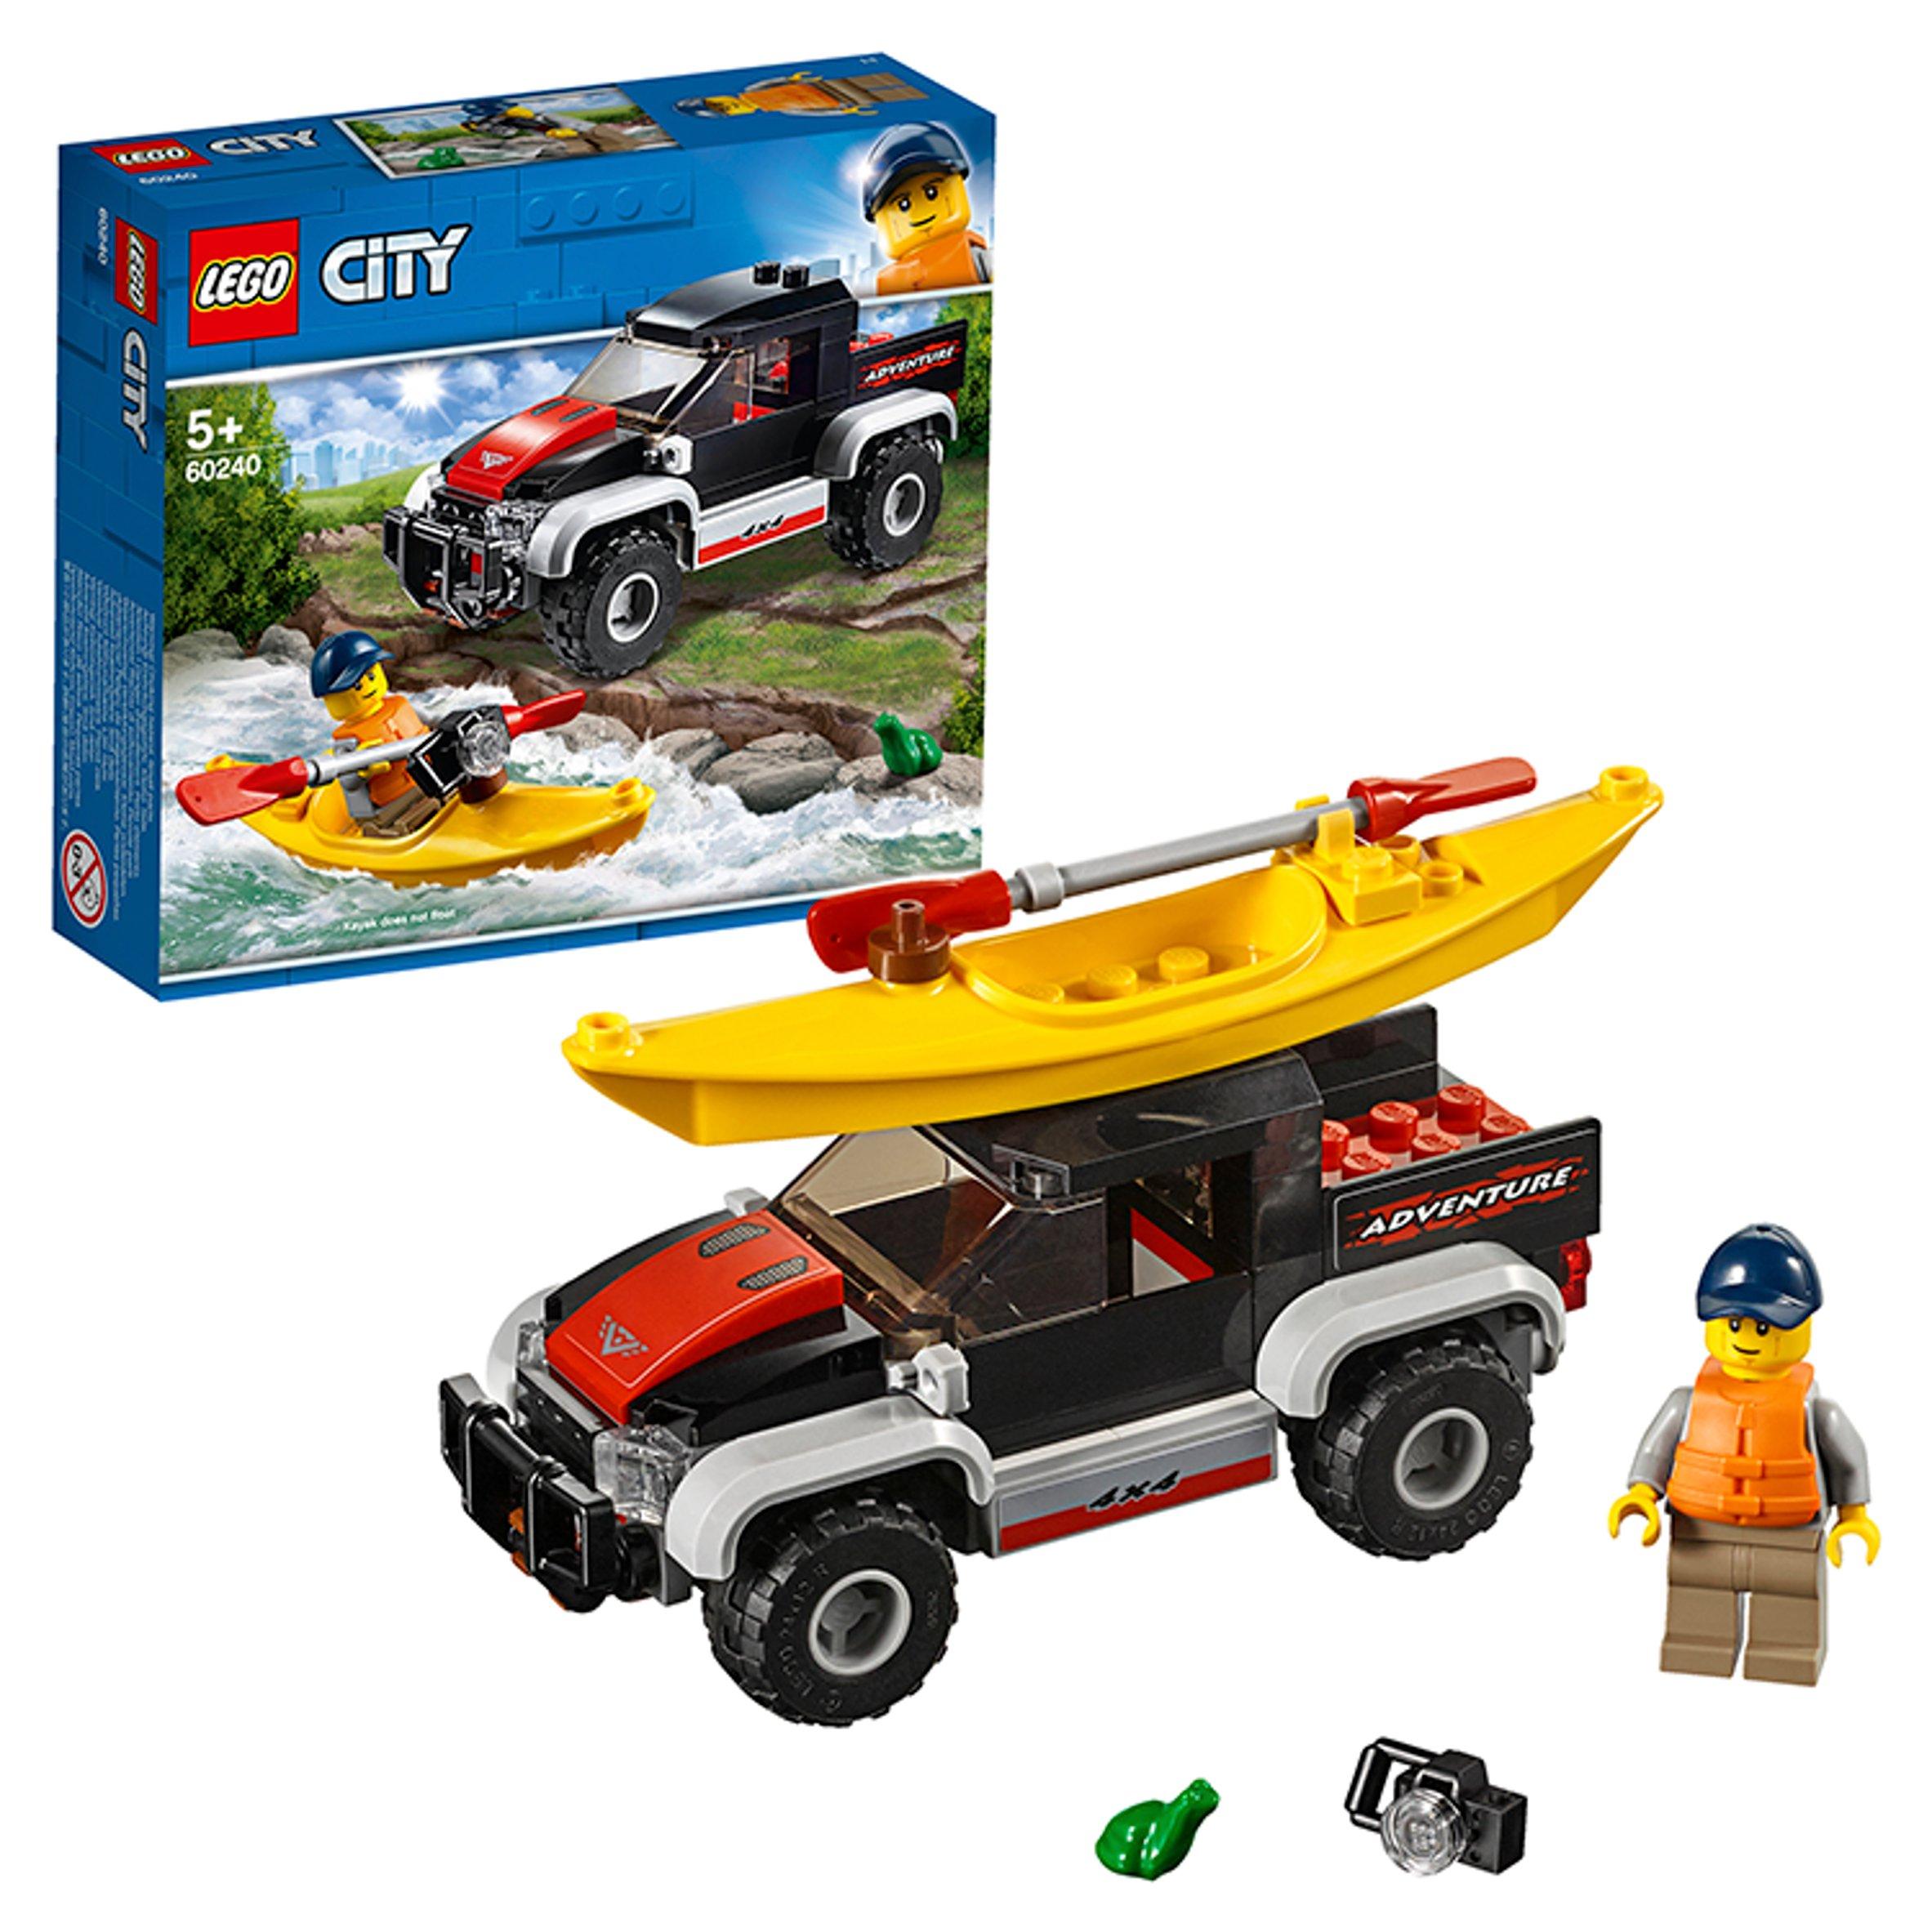 LEGO City Police Patrol Chase Car Toy 60239